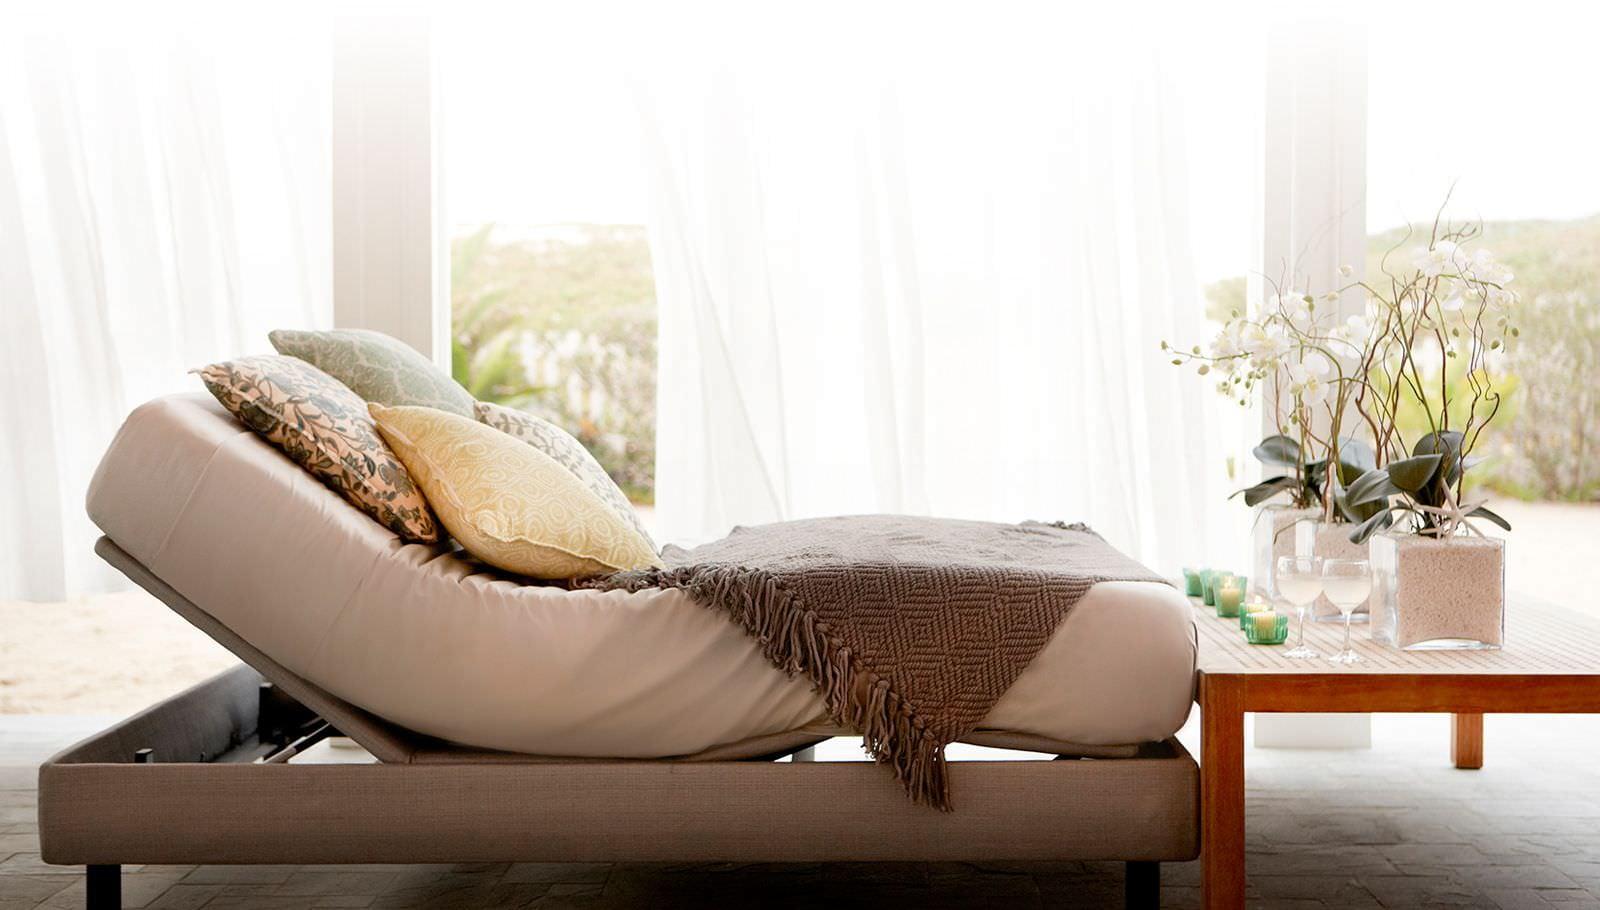 Amerisleep Adjustable Bed sitting in a sunny, bedroom setting.